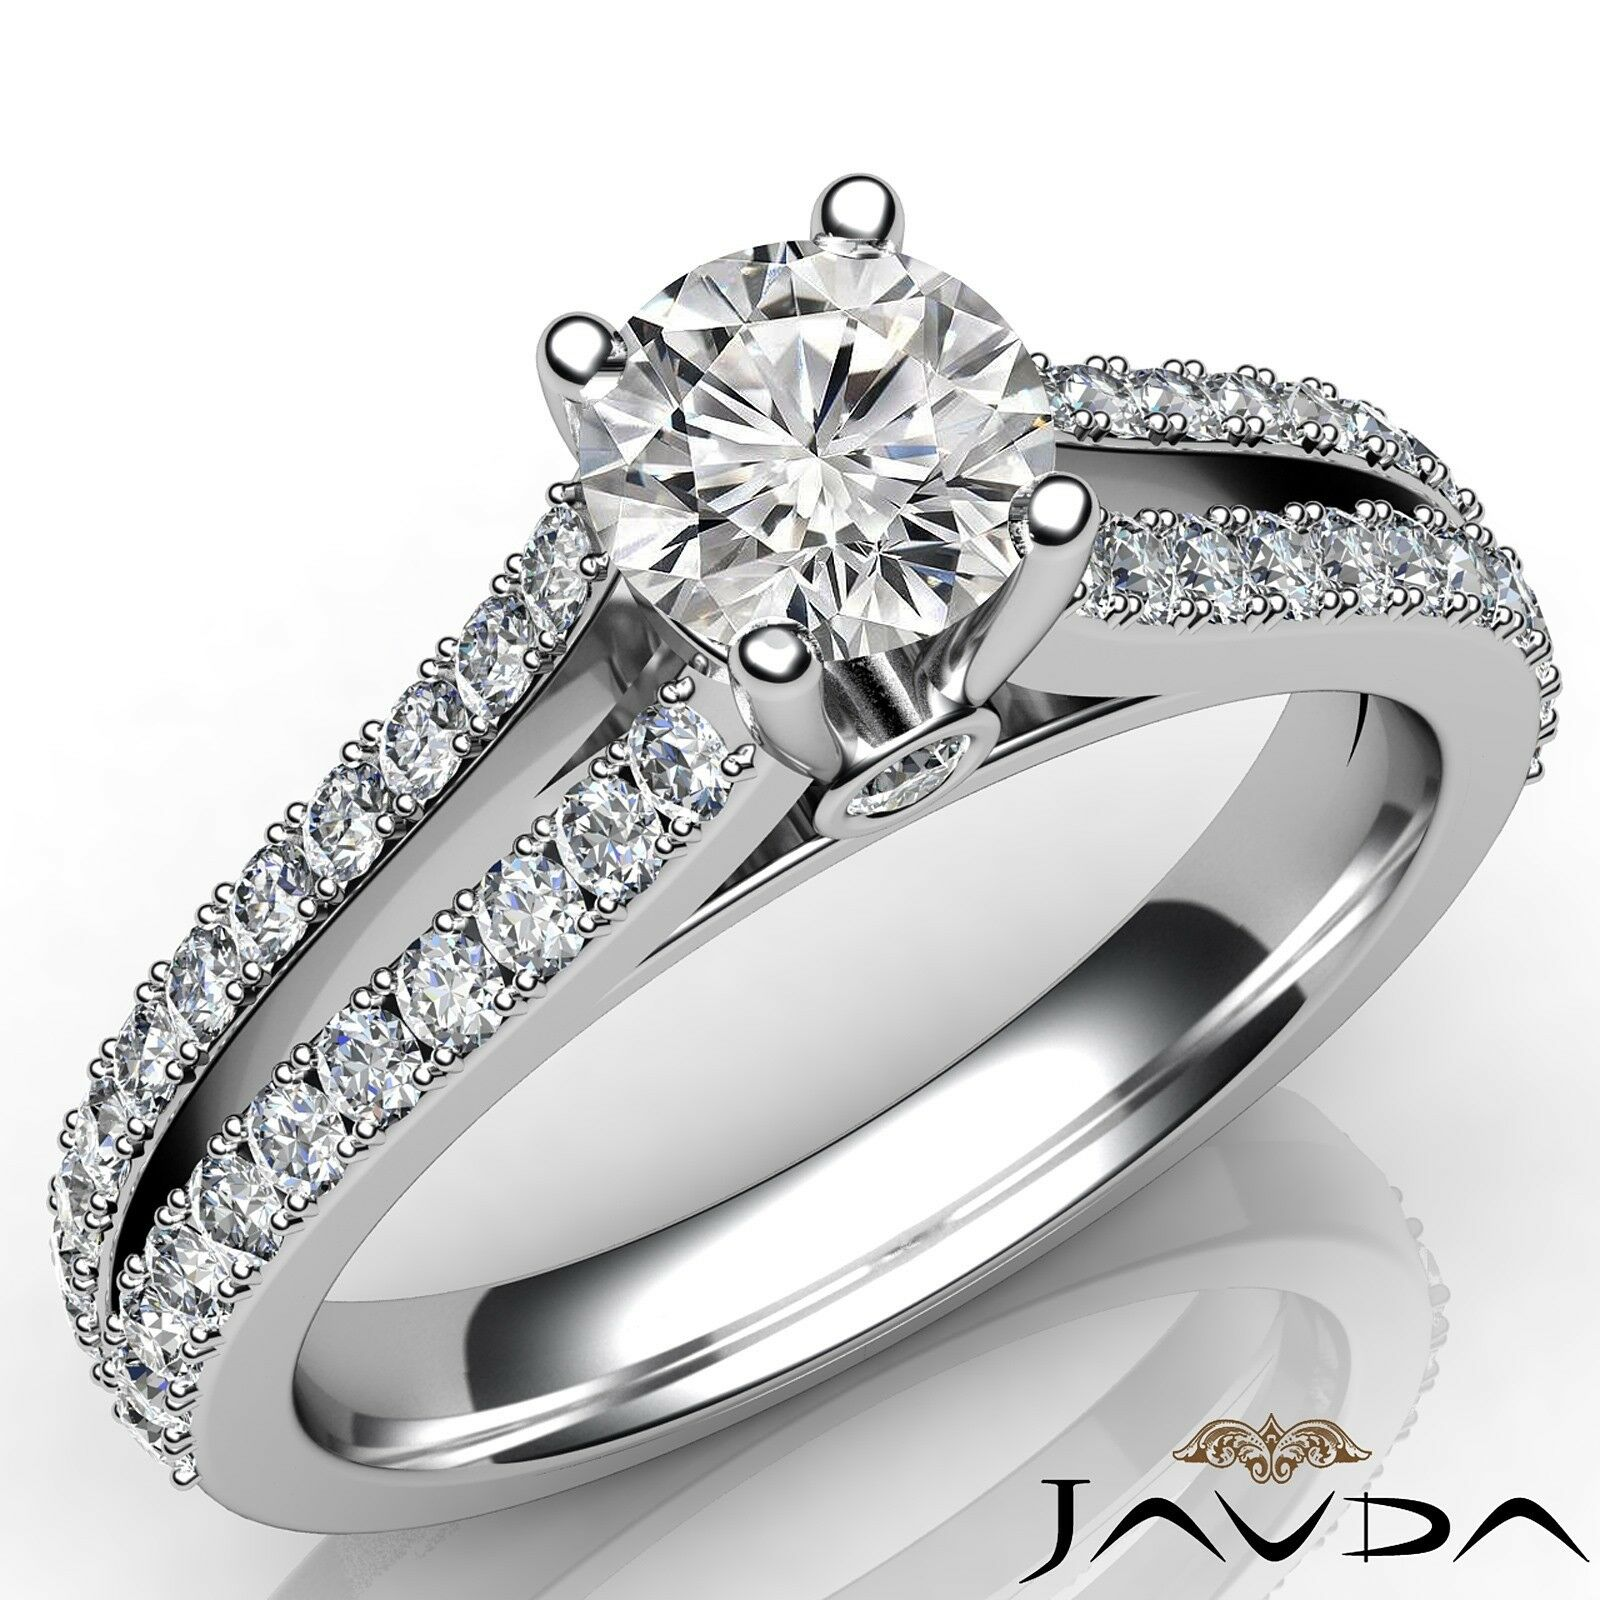 1.05ctw Prong Setting Round Diamond Engagement Ring GIA G-VVS2 White Gold Rings